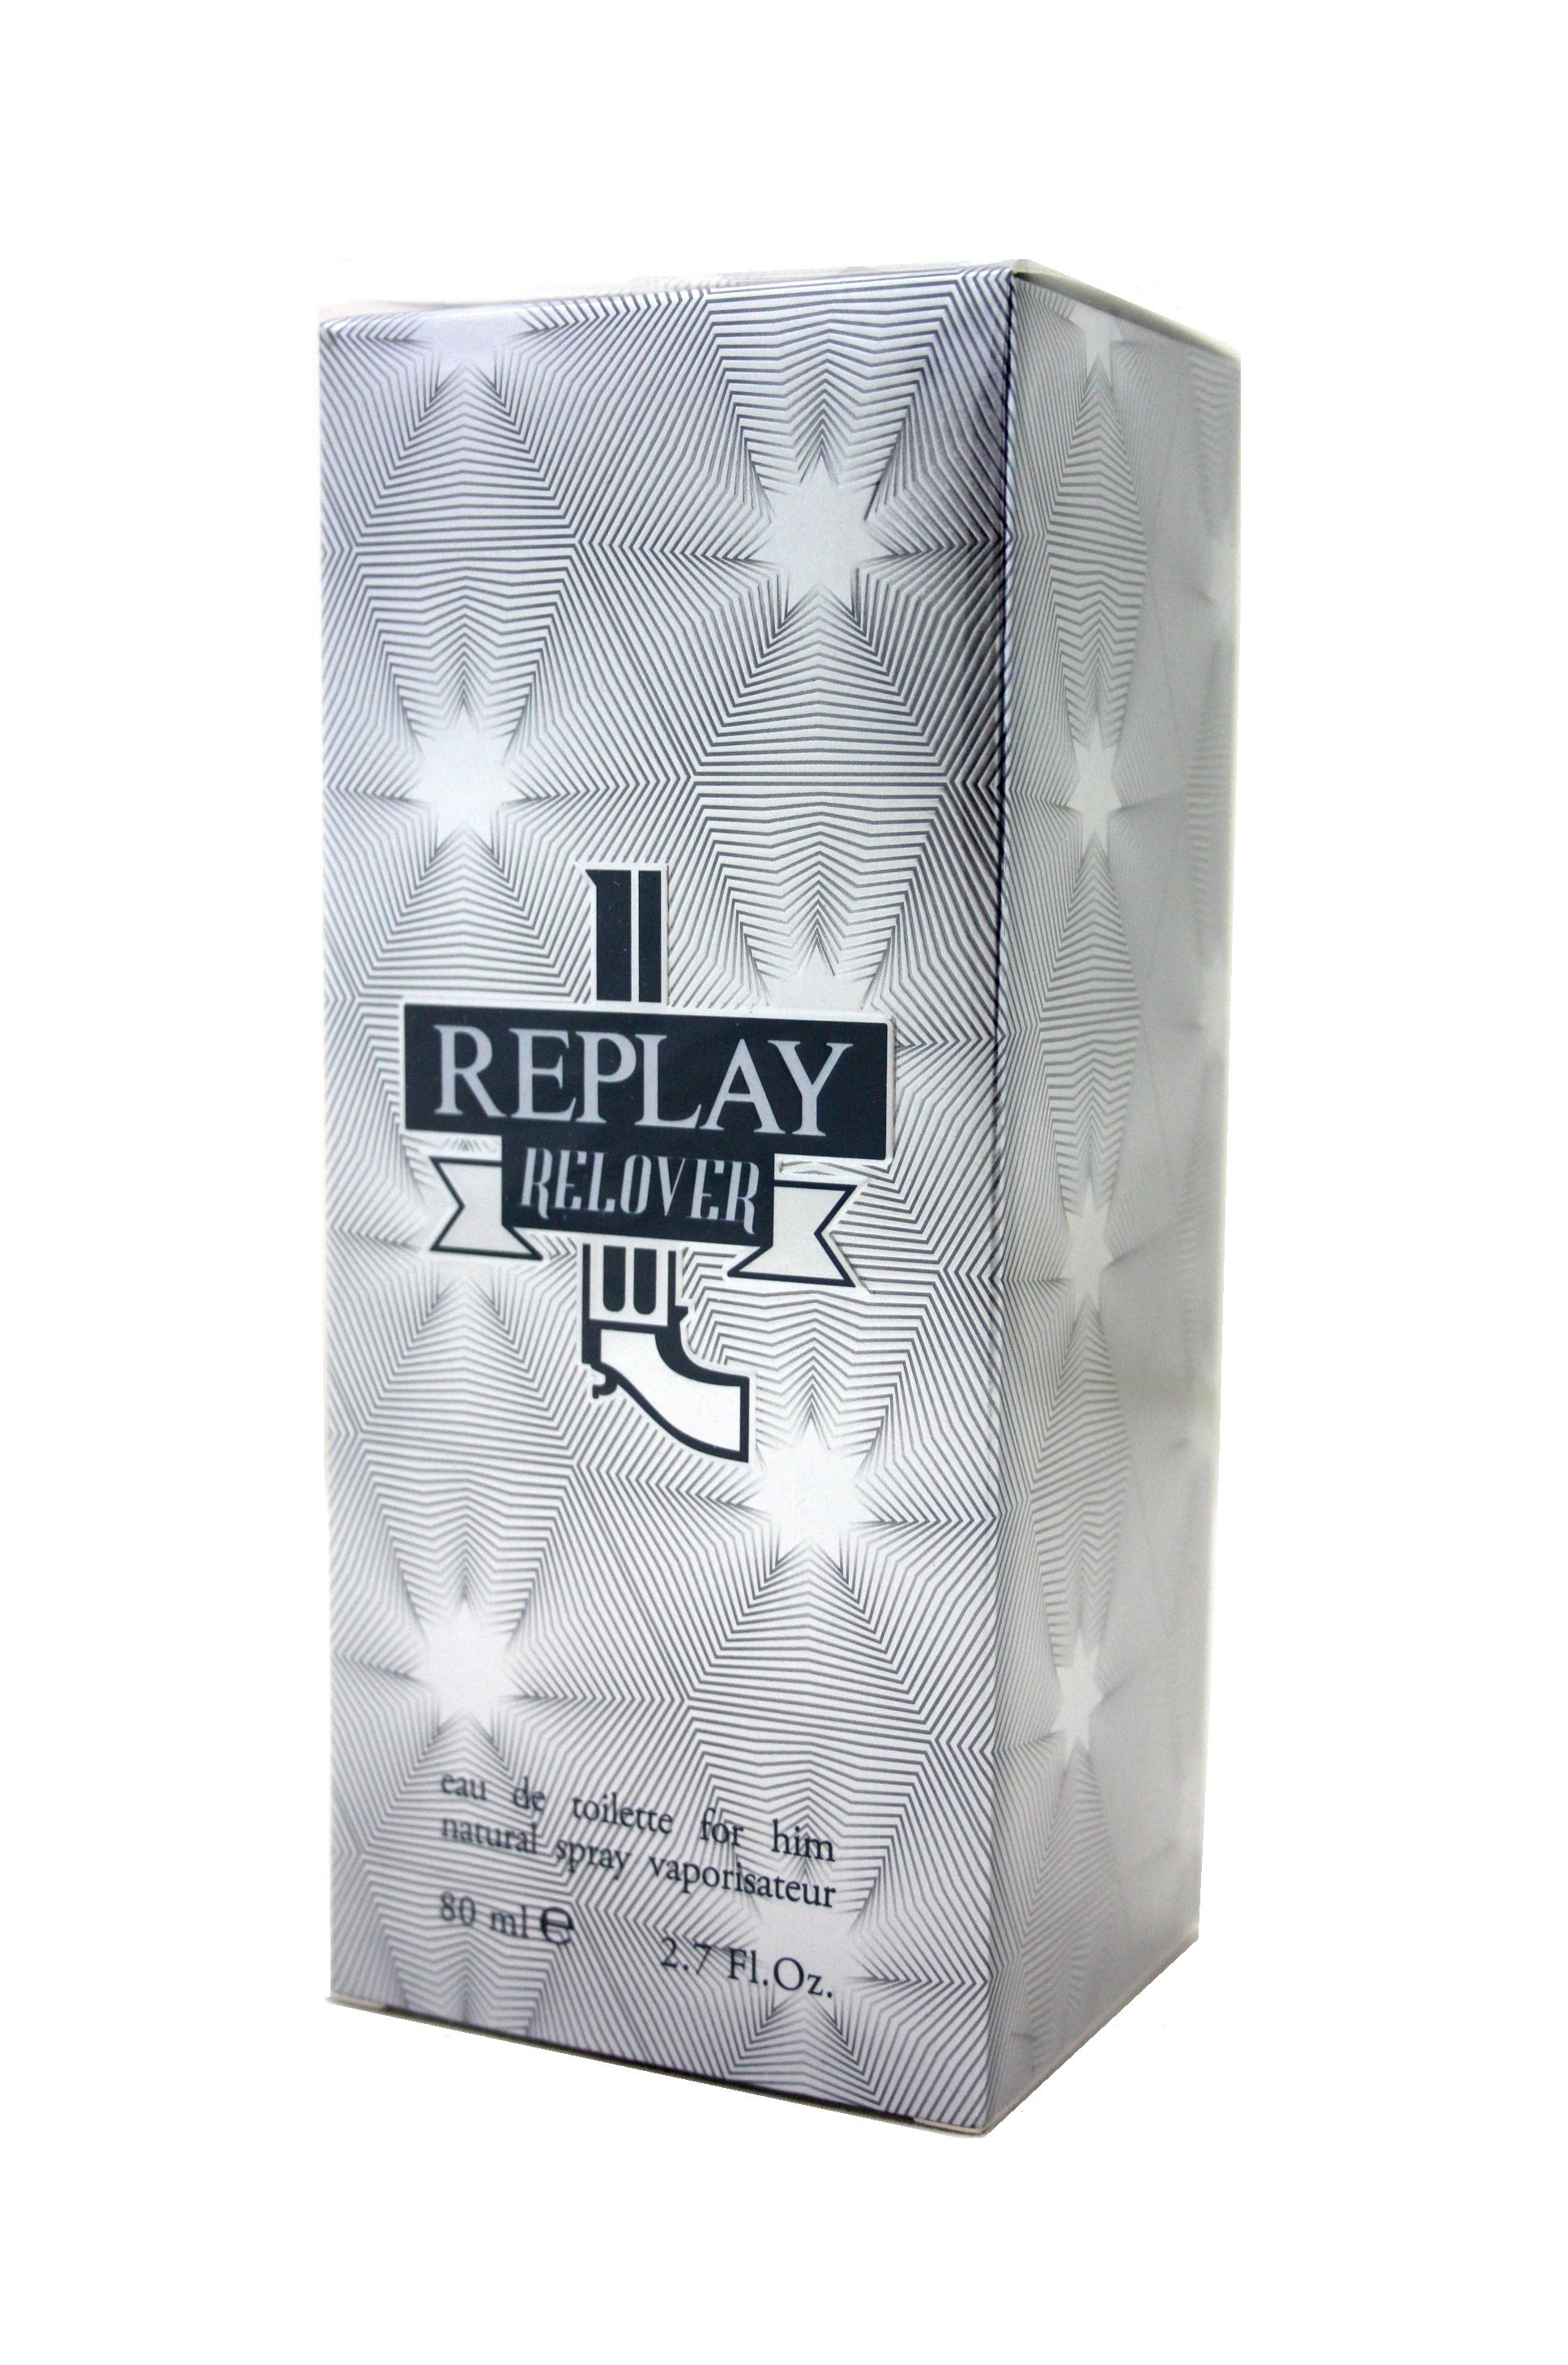 Replay Relover Eau de Toilette